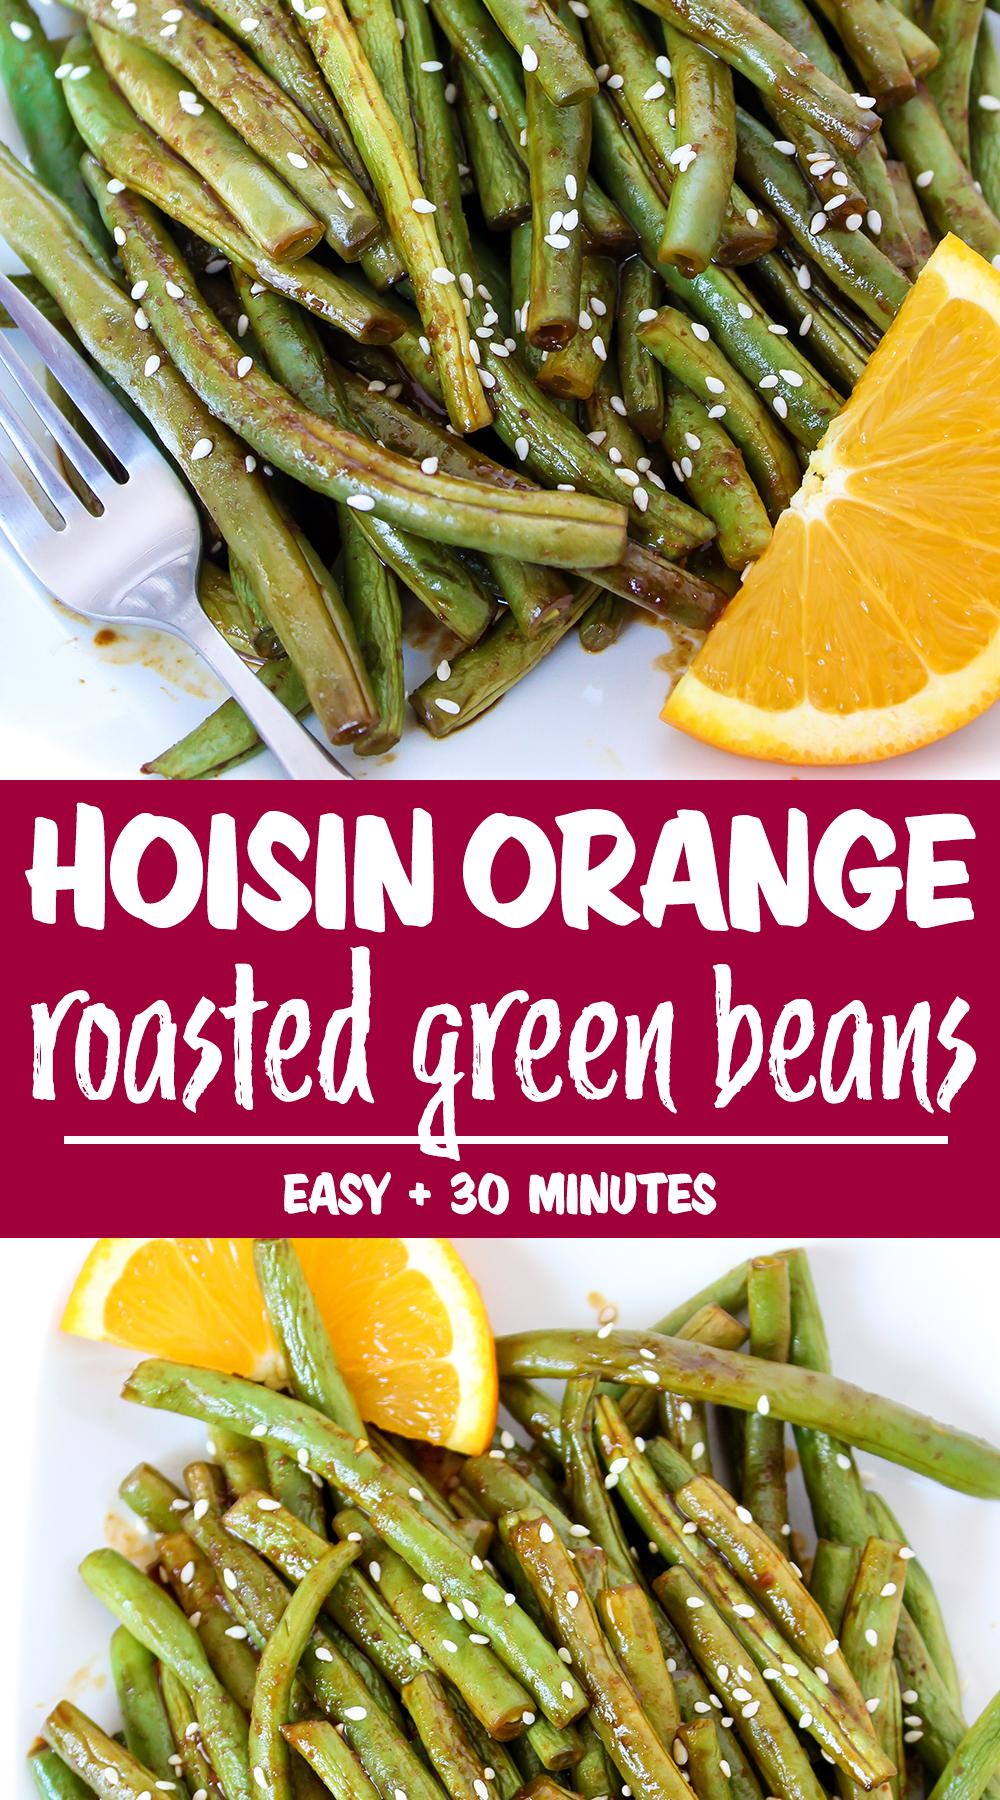 hoisin roasted green beans photo collage